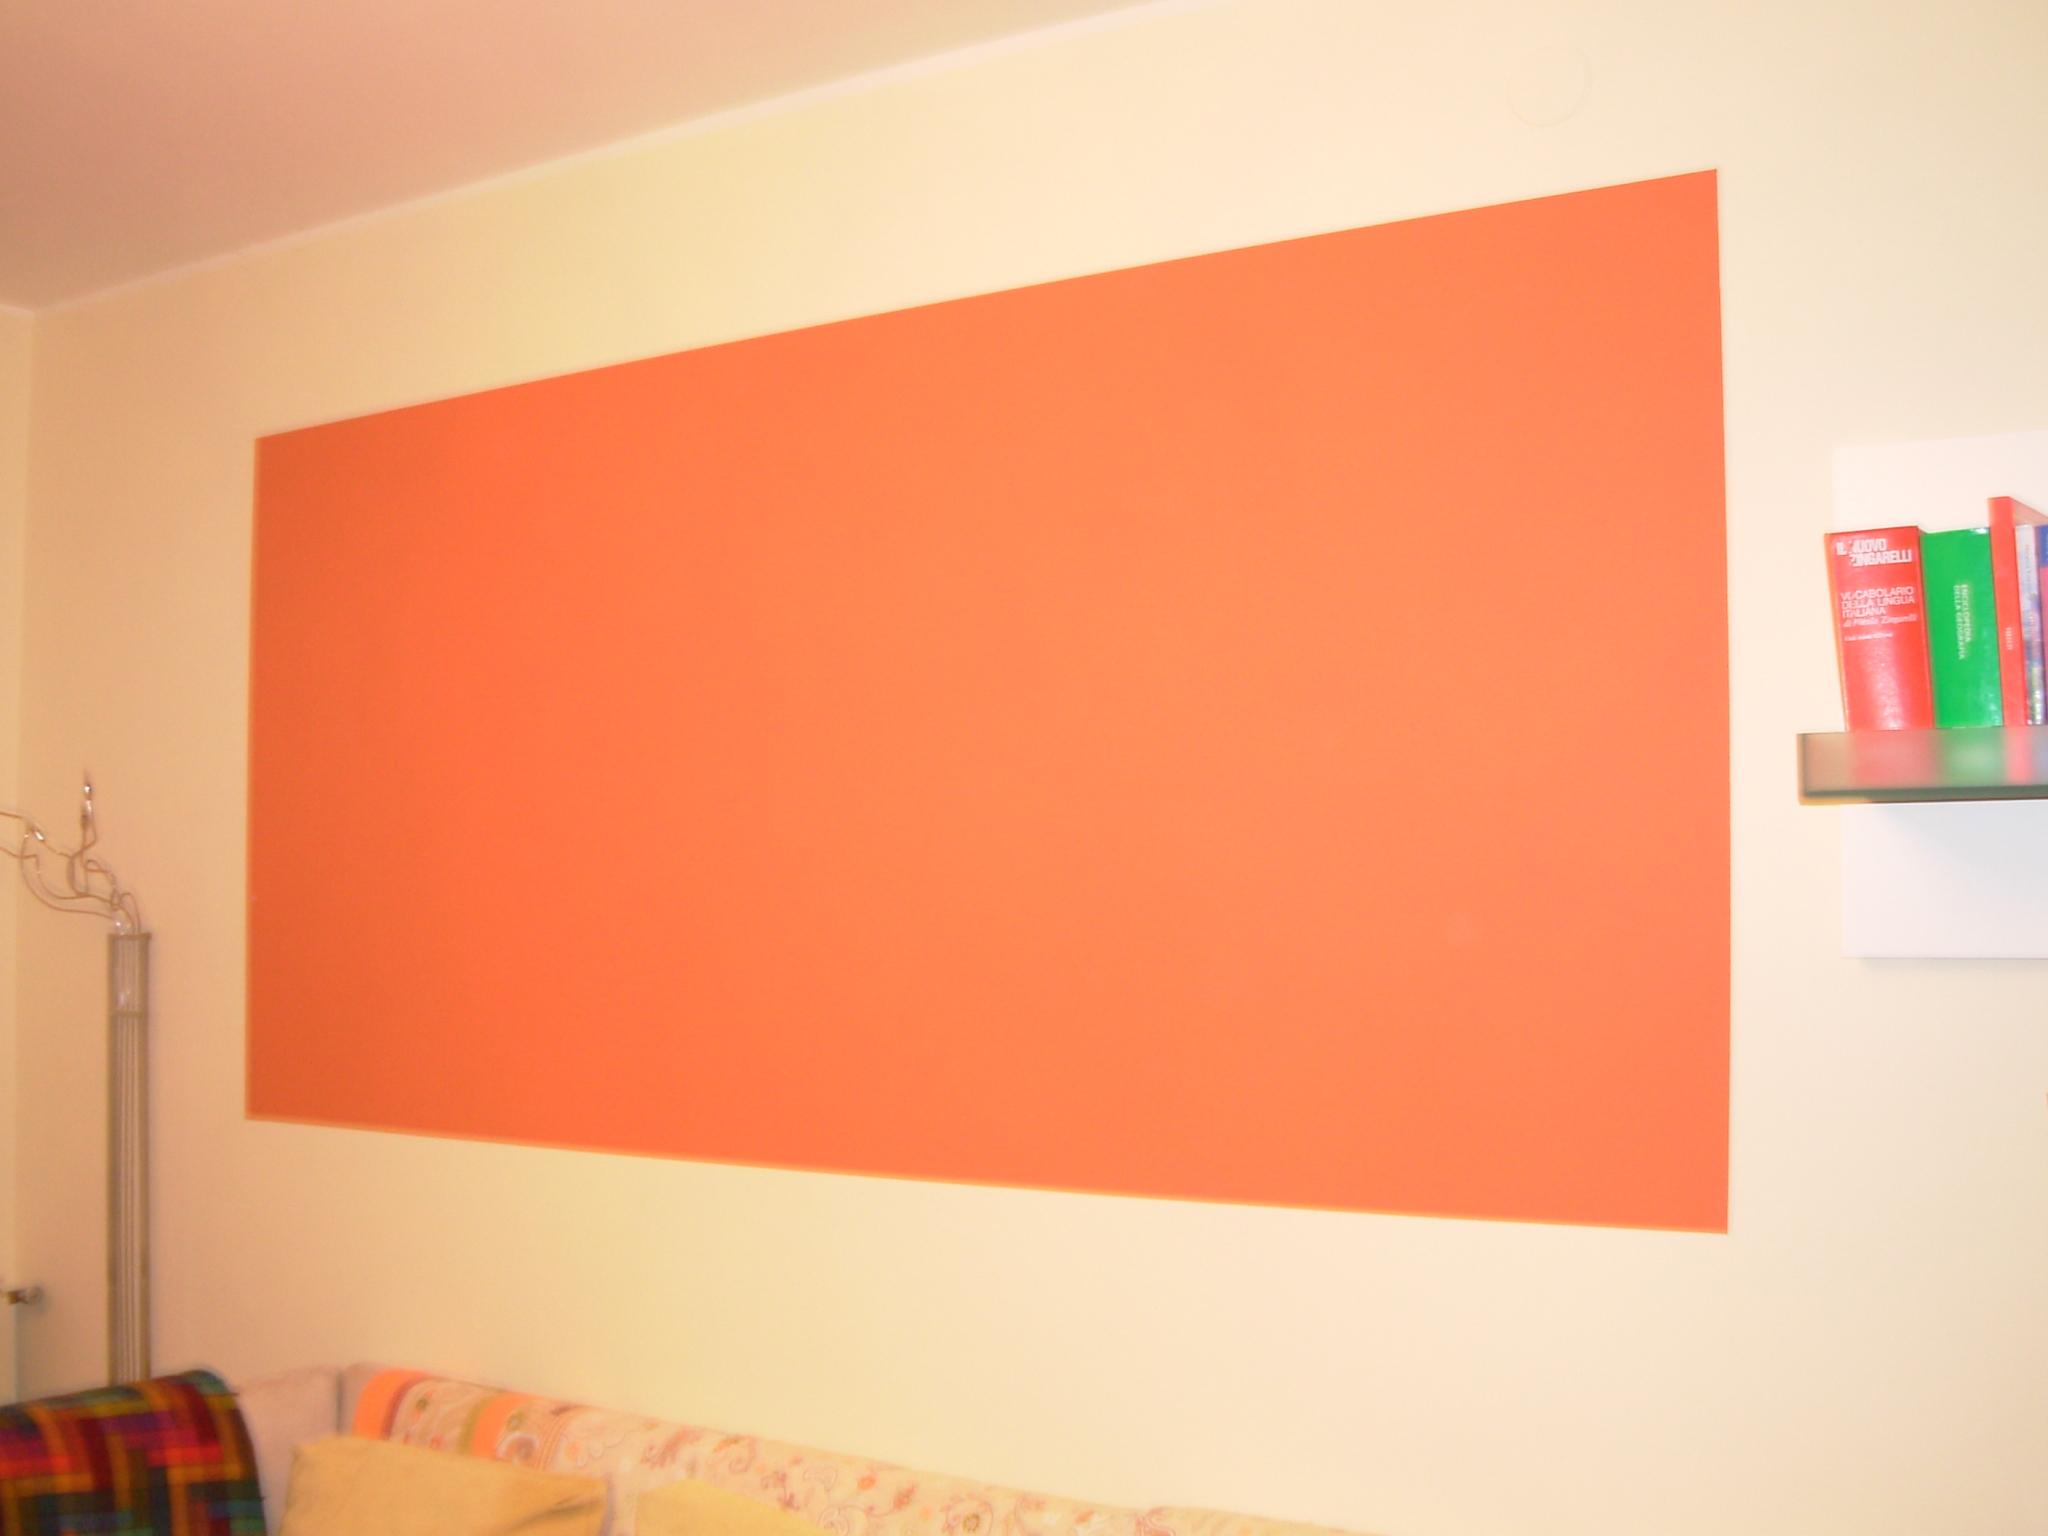 Casarella pitture per interni padova - Effetti decorativi pittura ...